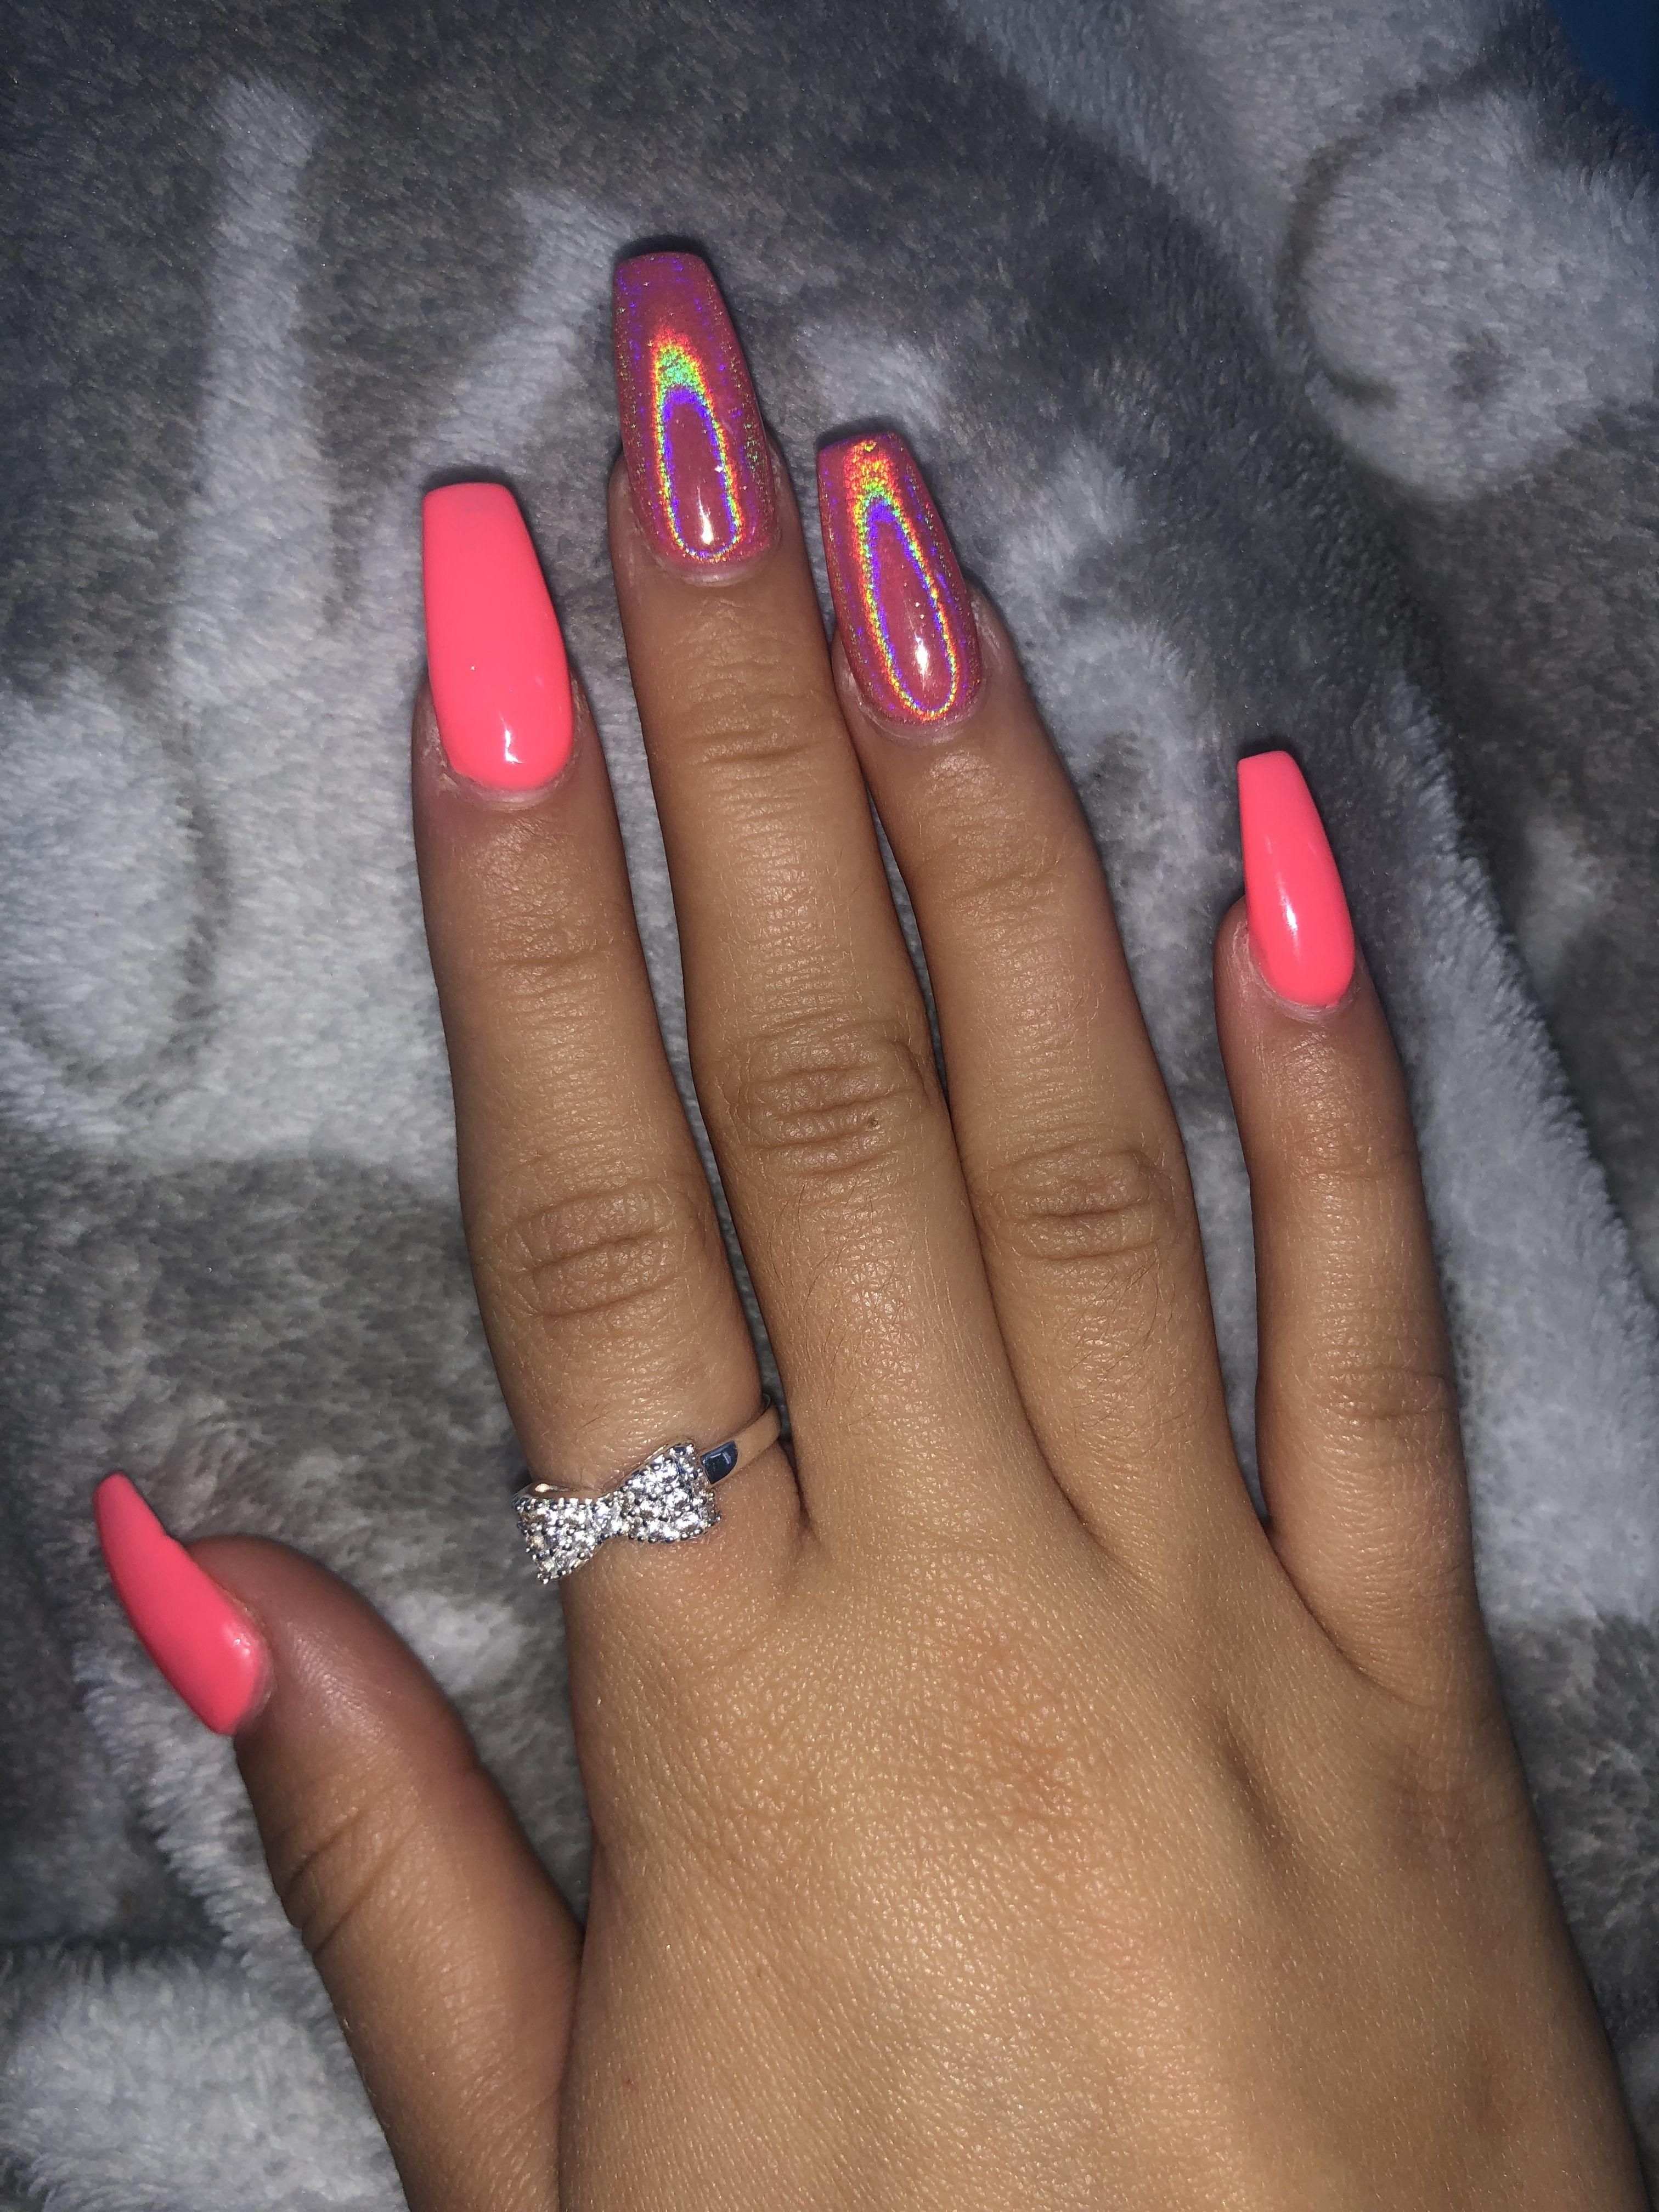 Holographic Nails Pink Acrylic Nails Acrylic Nails Coffin Pink Colored Acrylic Nails